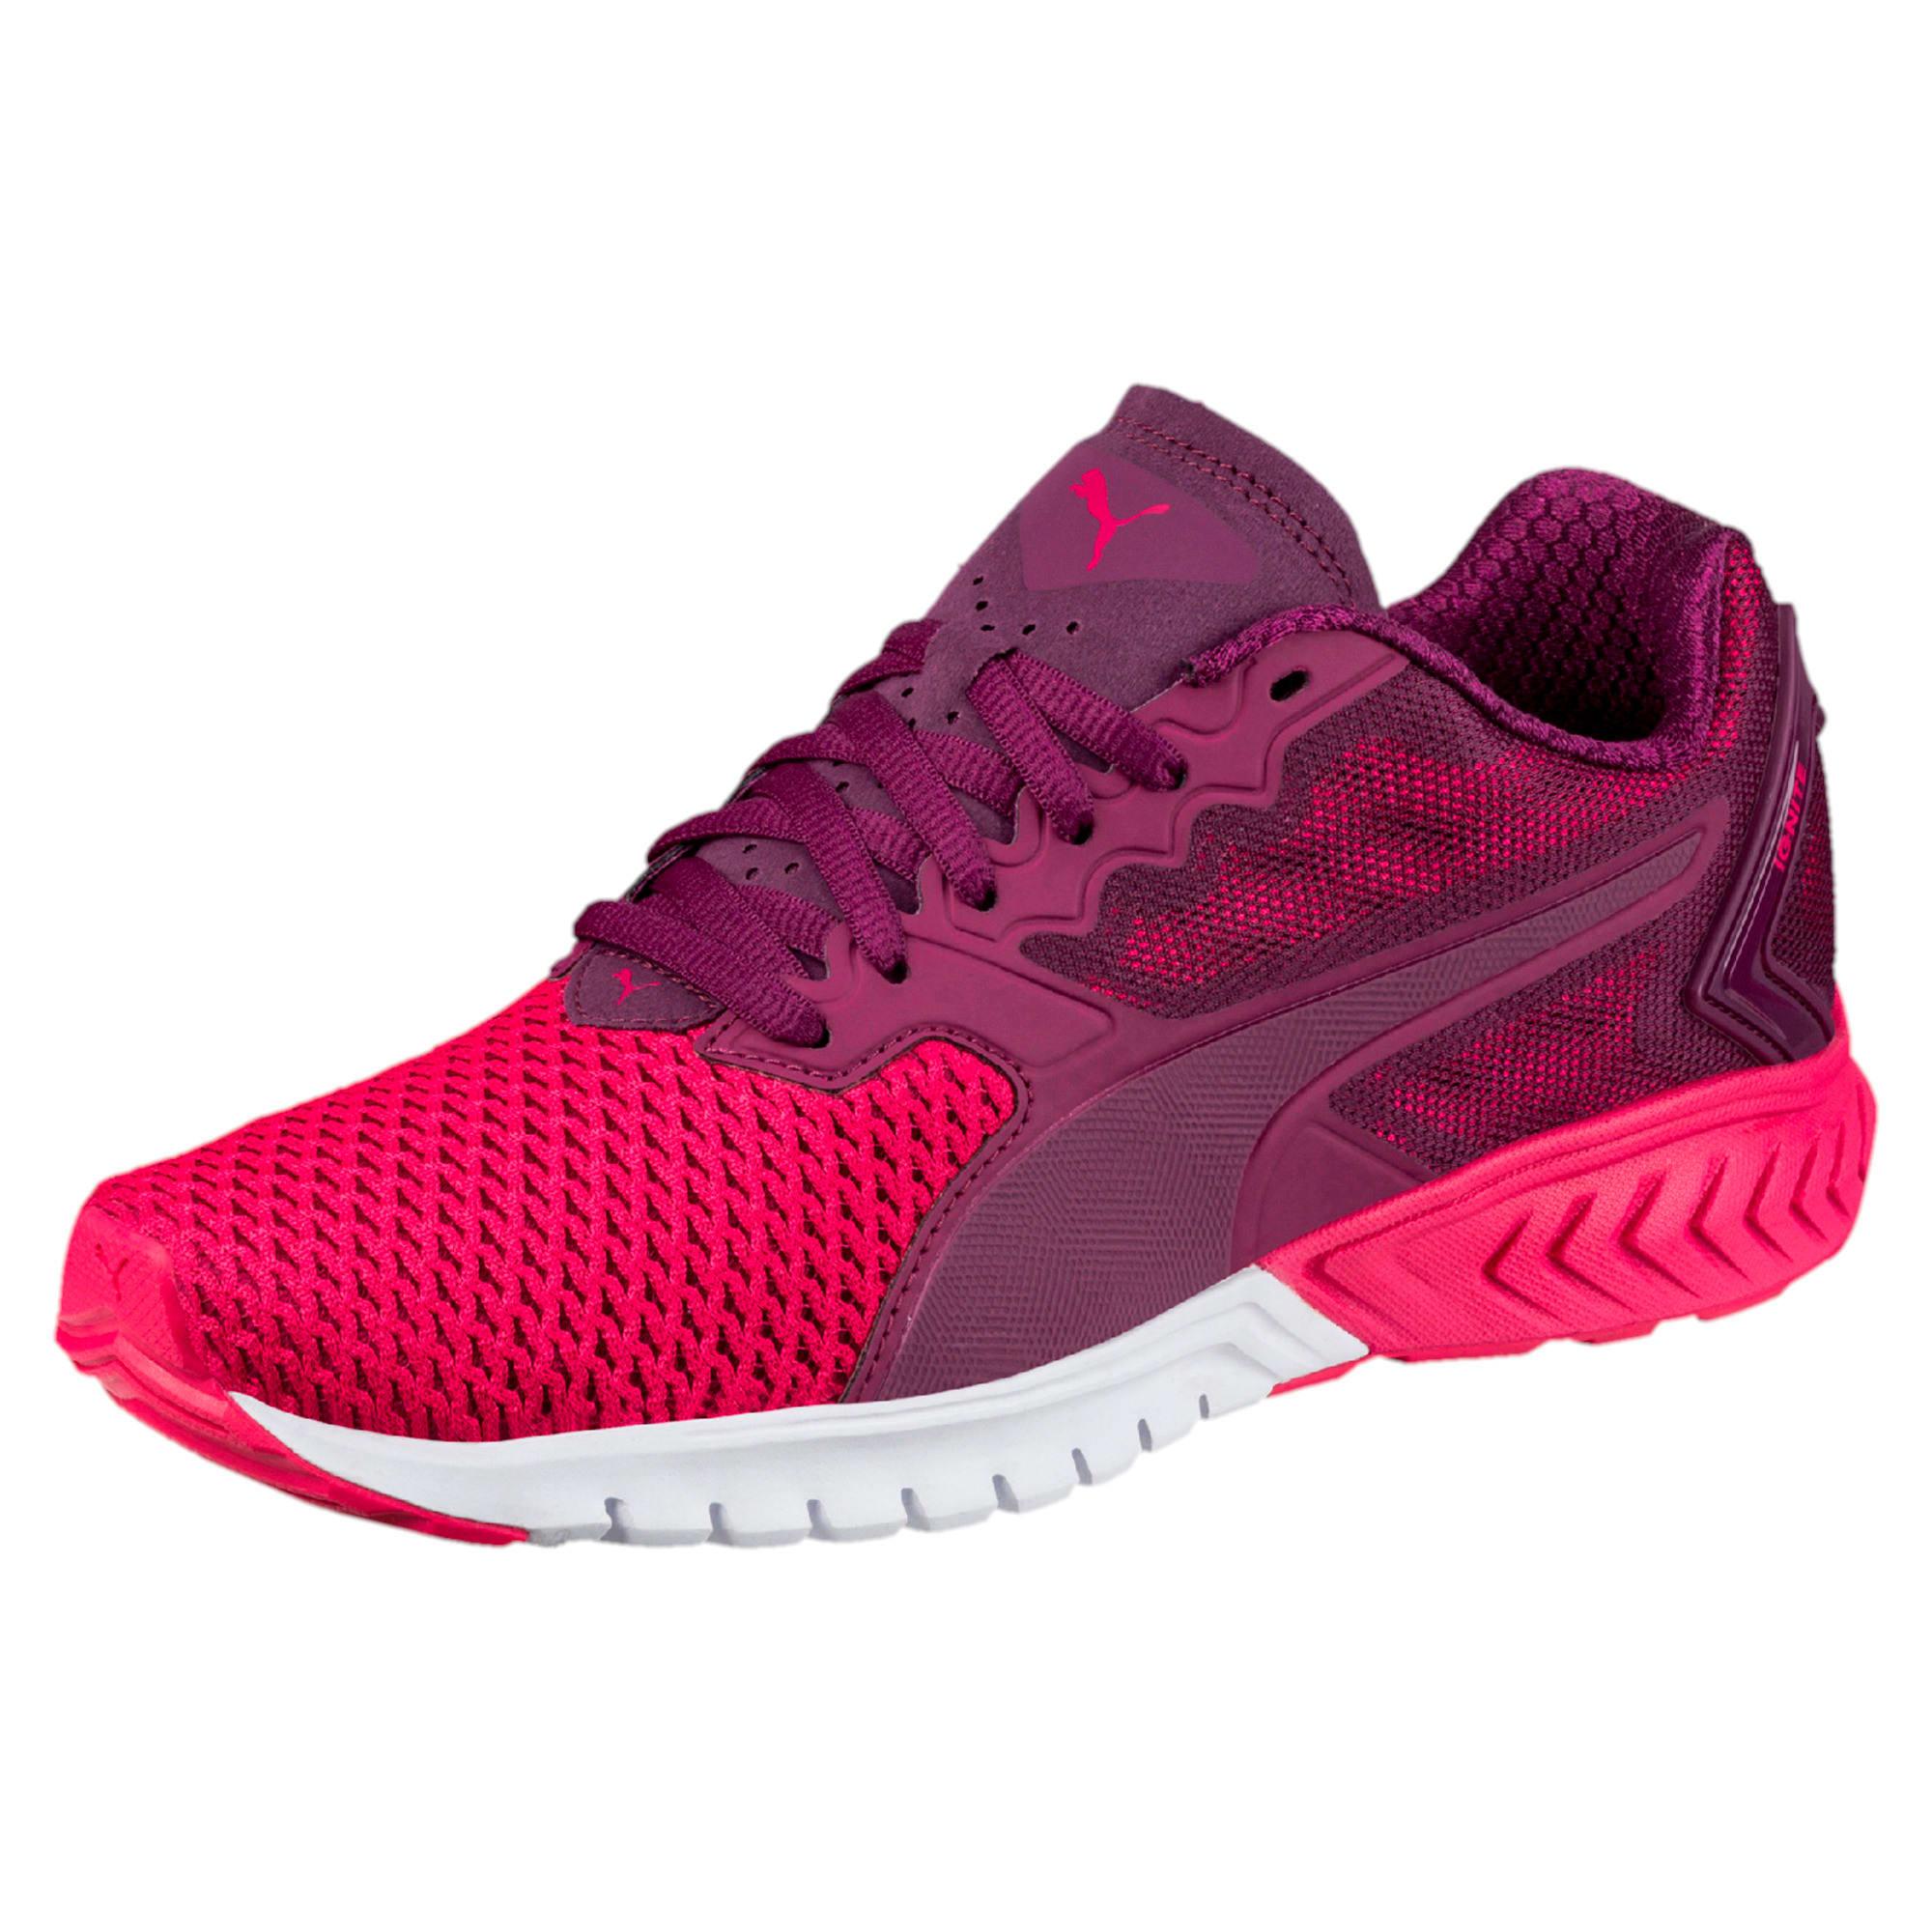 Thumbnail 1 of IGNITE Dual Mesh Women's Running Shoes, Dark Purple-Love Potion, medium-IND